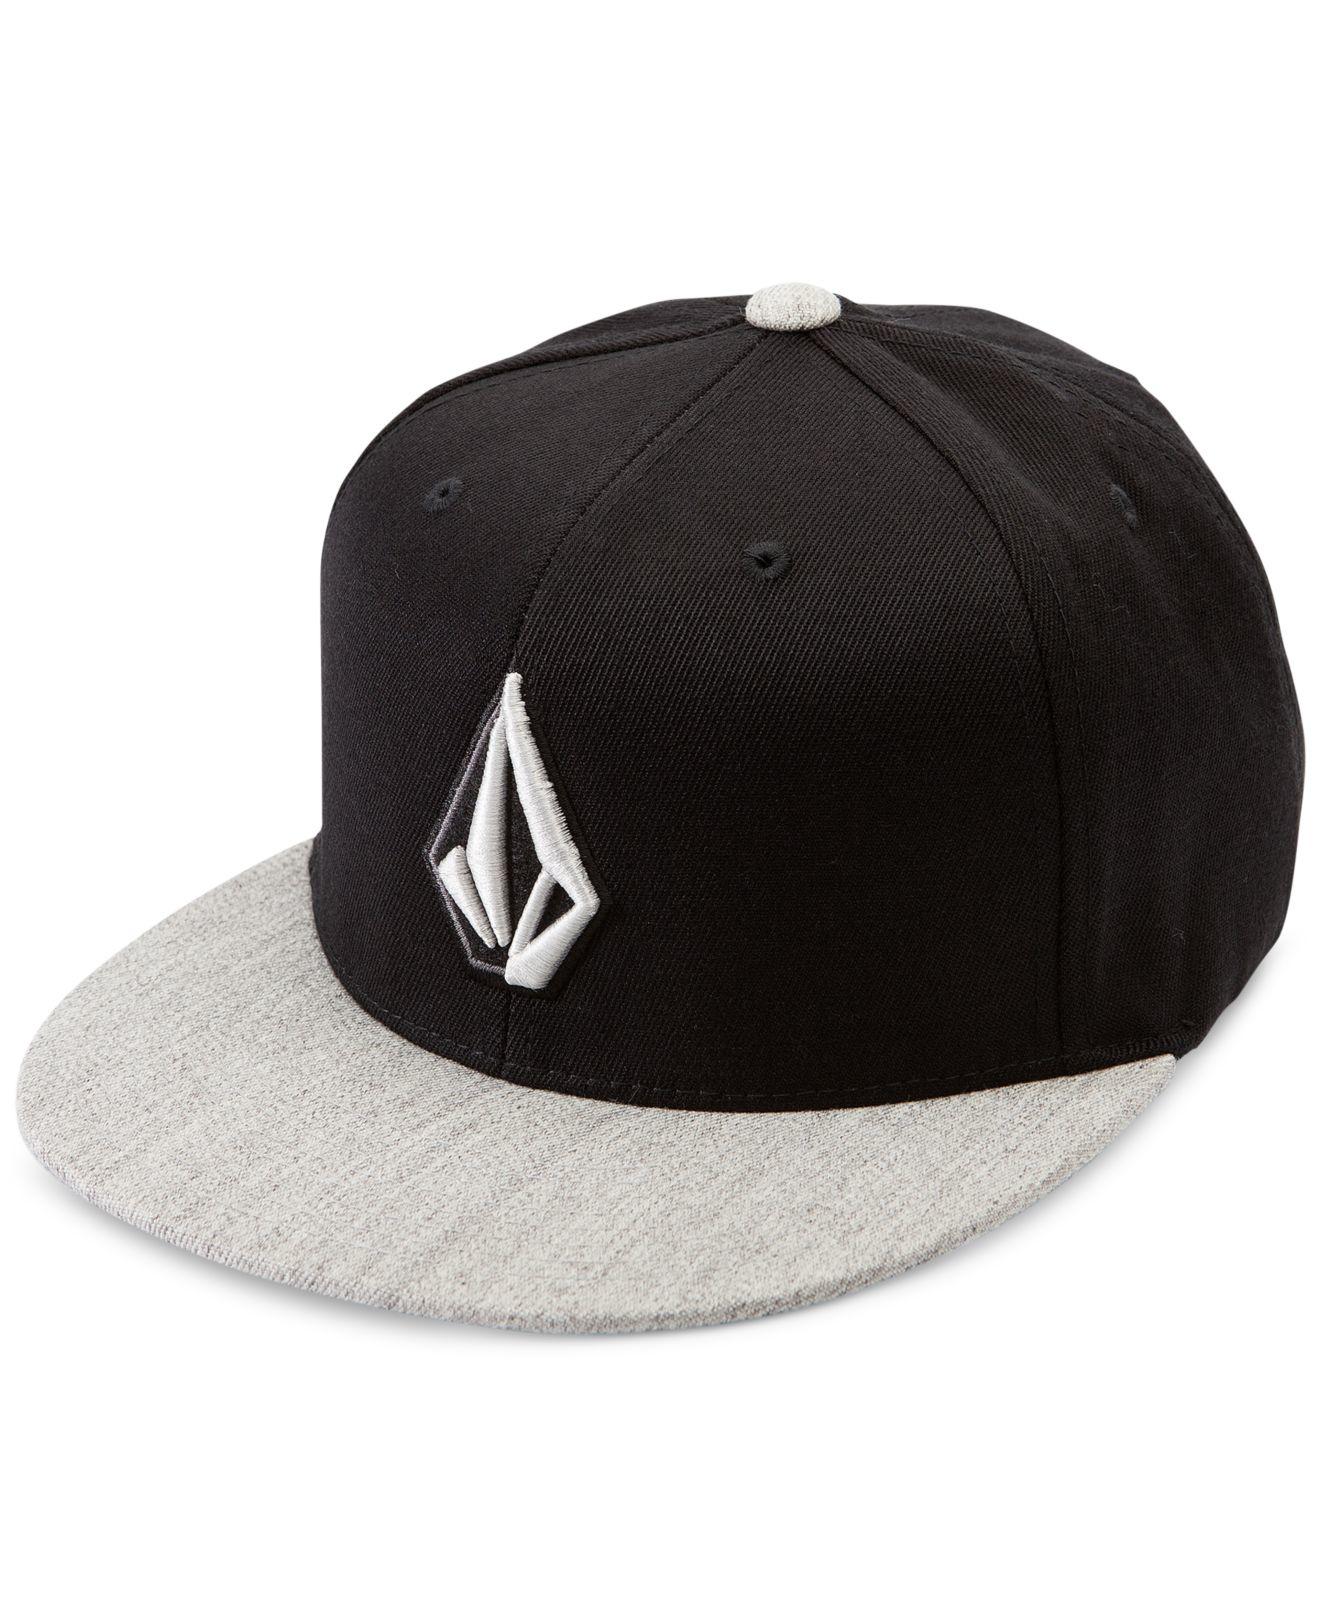 08d7f3f04a8 Lyst - Volcom Stone Slab Flat Brim Hat in Gray for Men